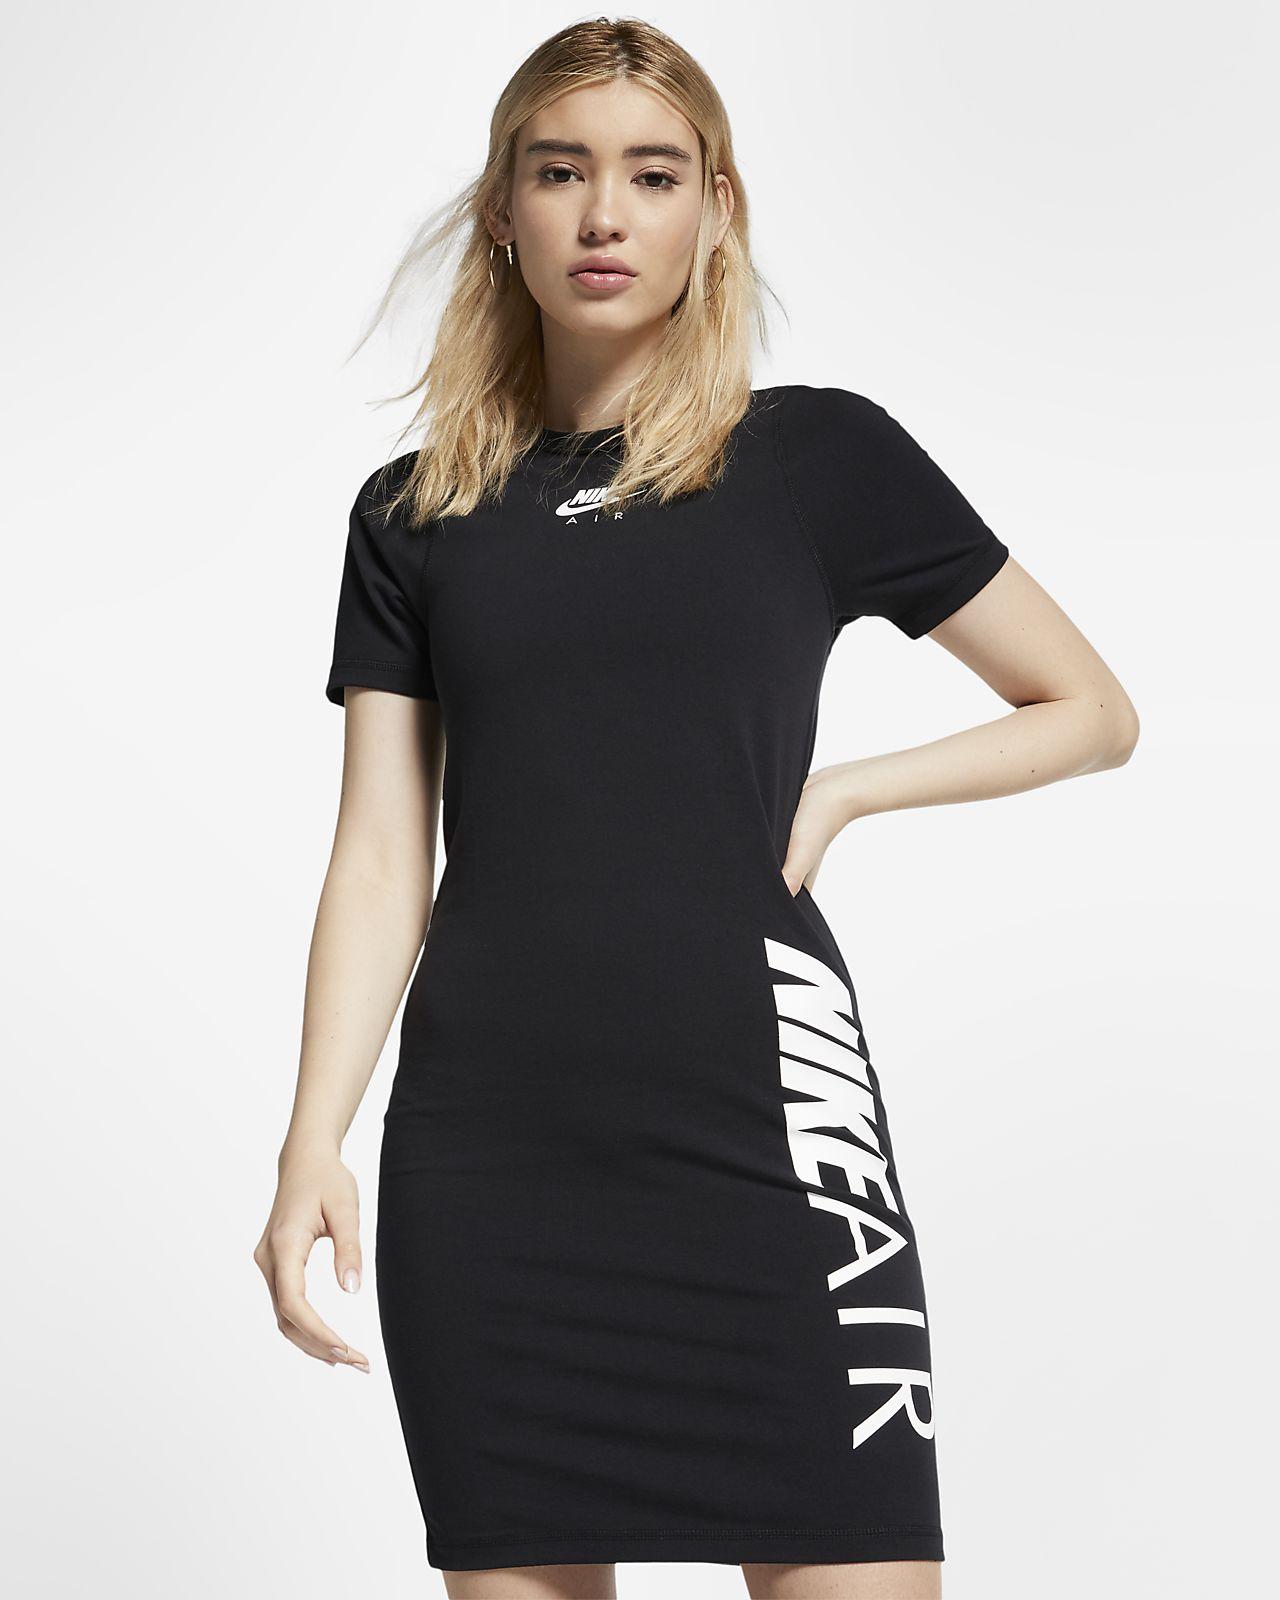 9cbc2d7f16 Low Resolution Nike Air női ruha Nike Air női ruha